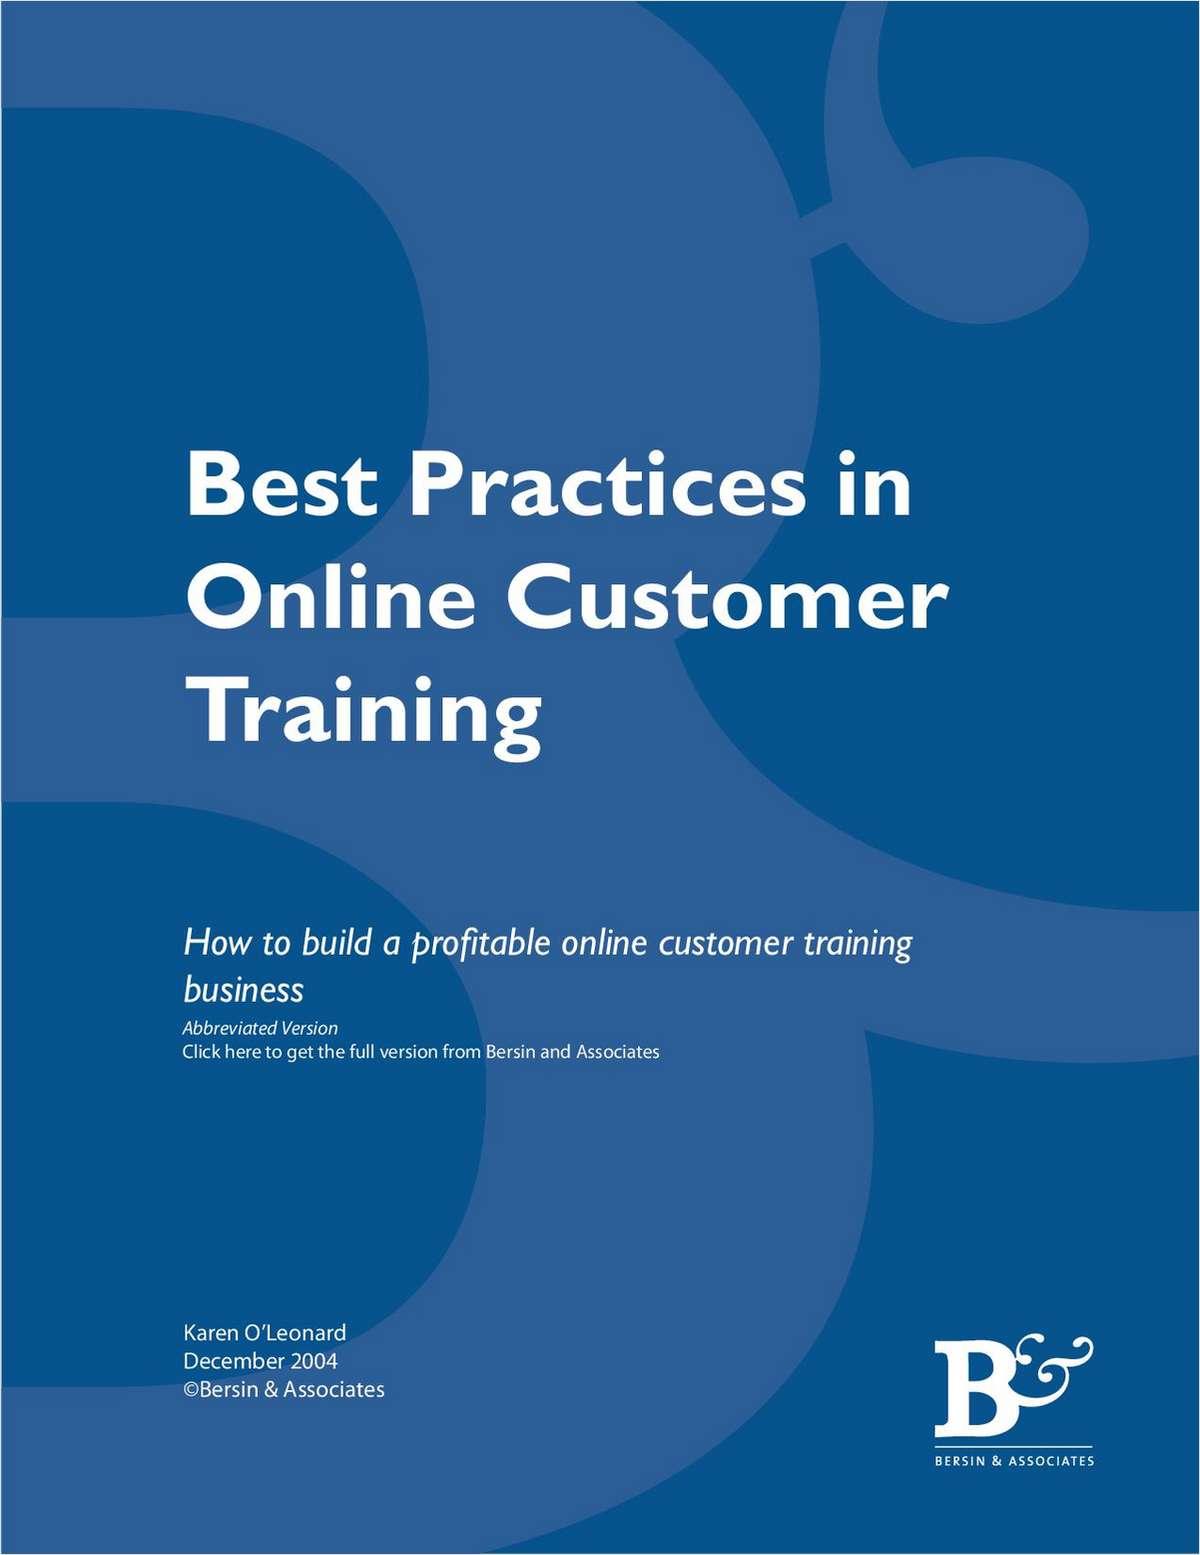 Best Practices in Online Customer Training